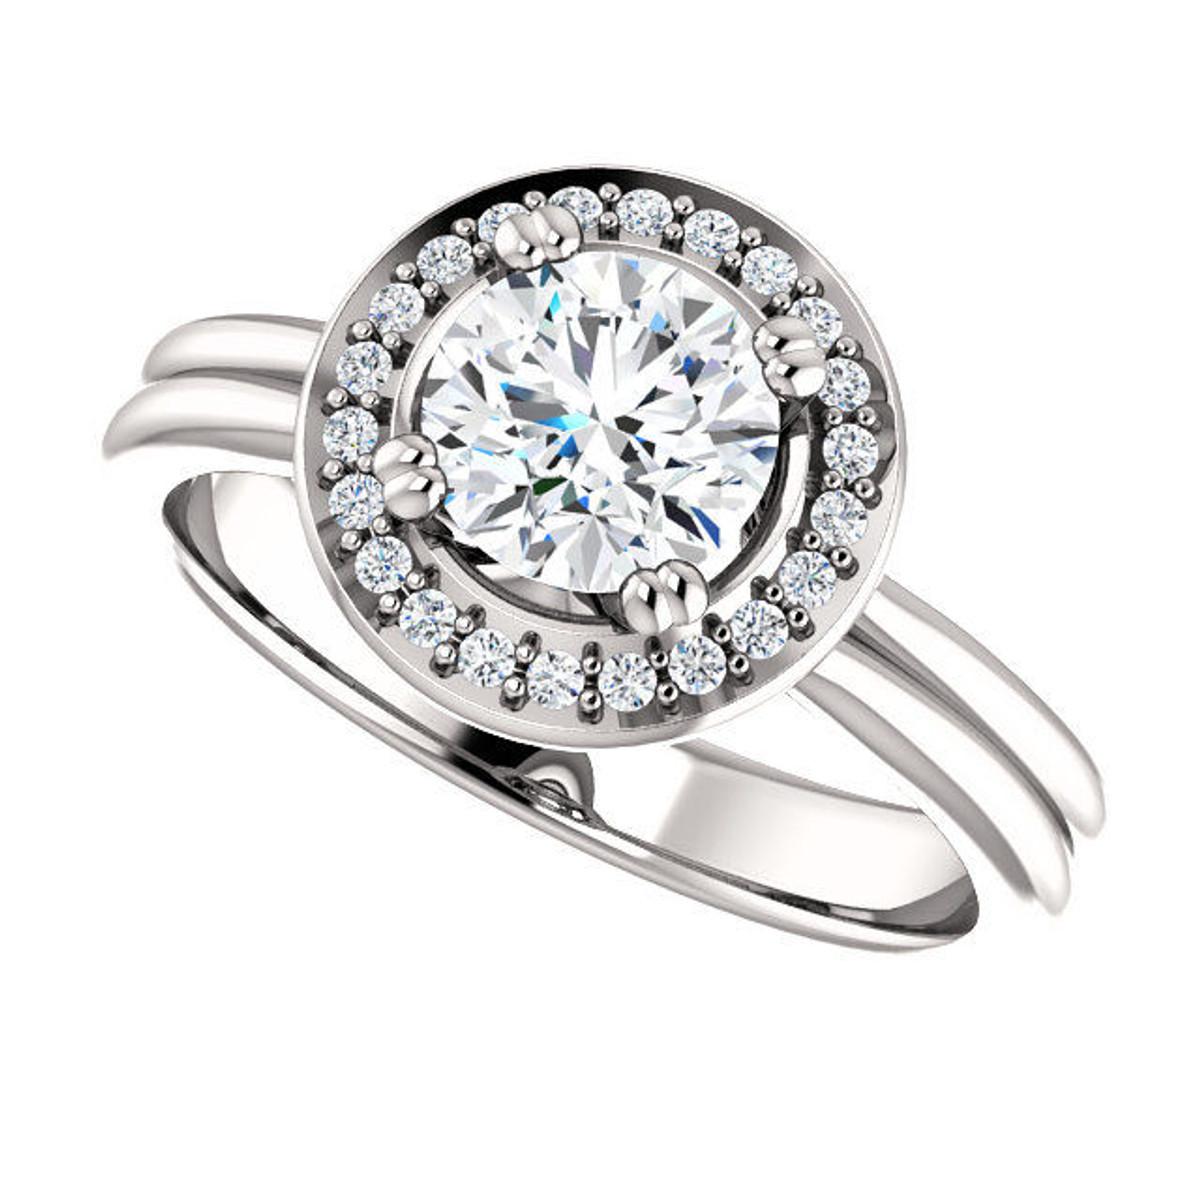 White Gold Round Halo Engagement Ring